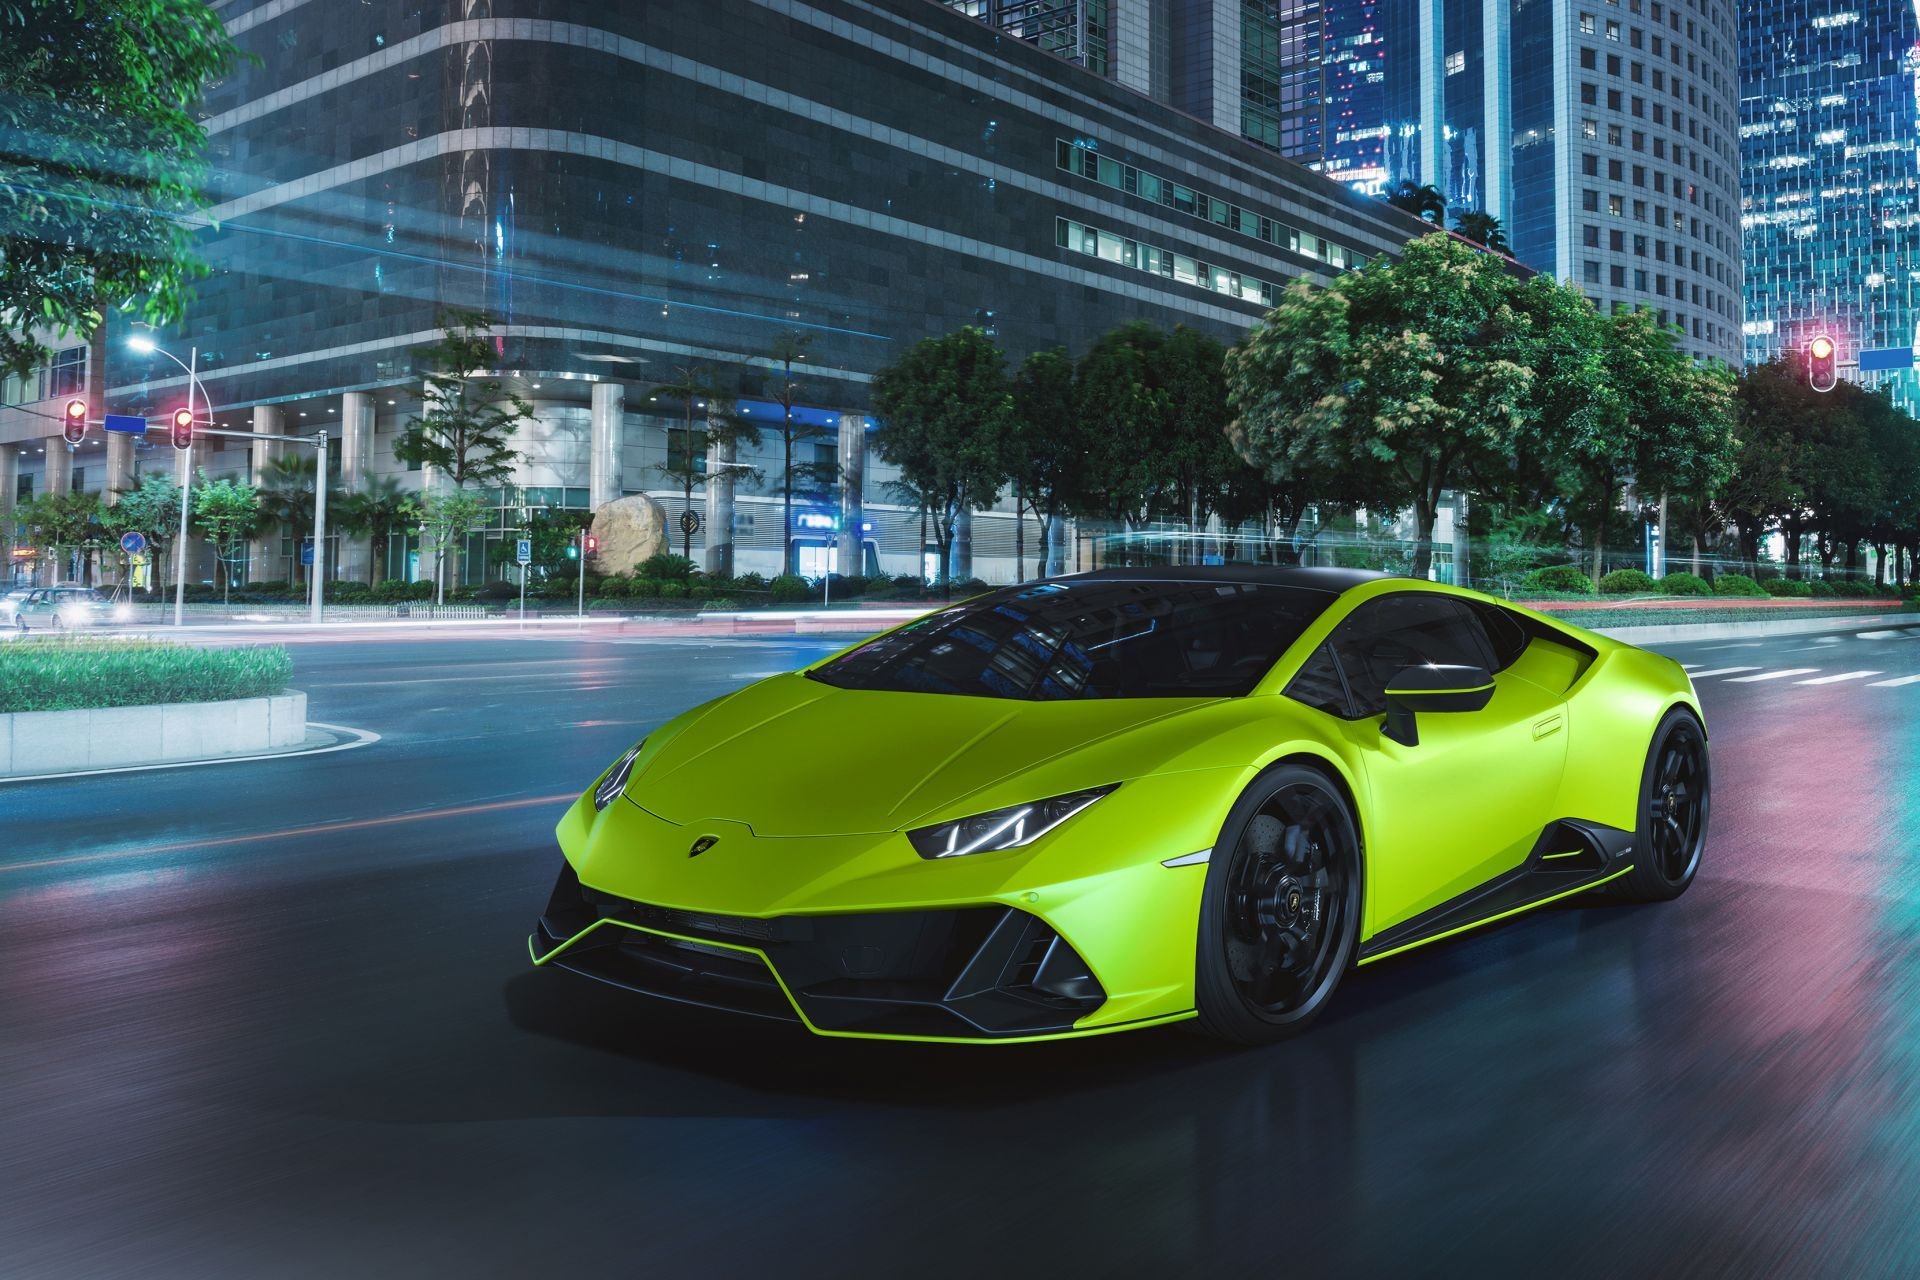 Lamborghini-Huracan-Evo-Fluo-Capsule-15